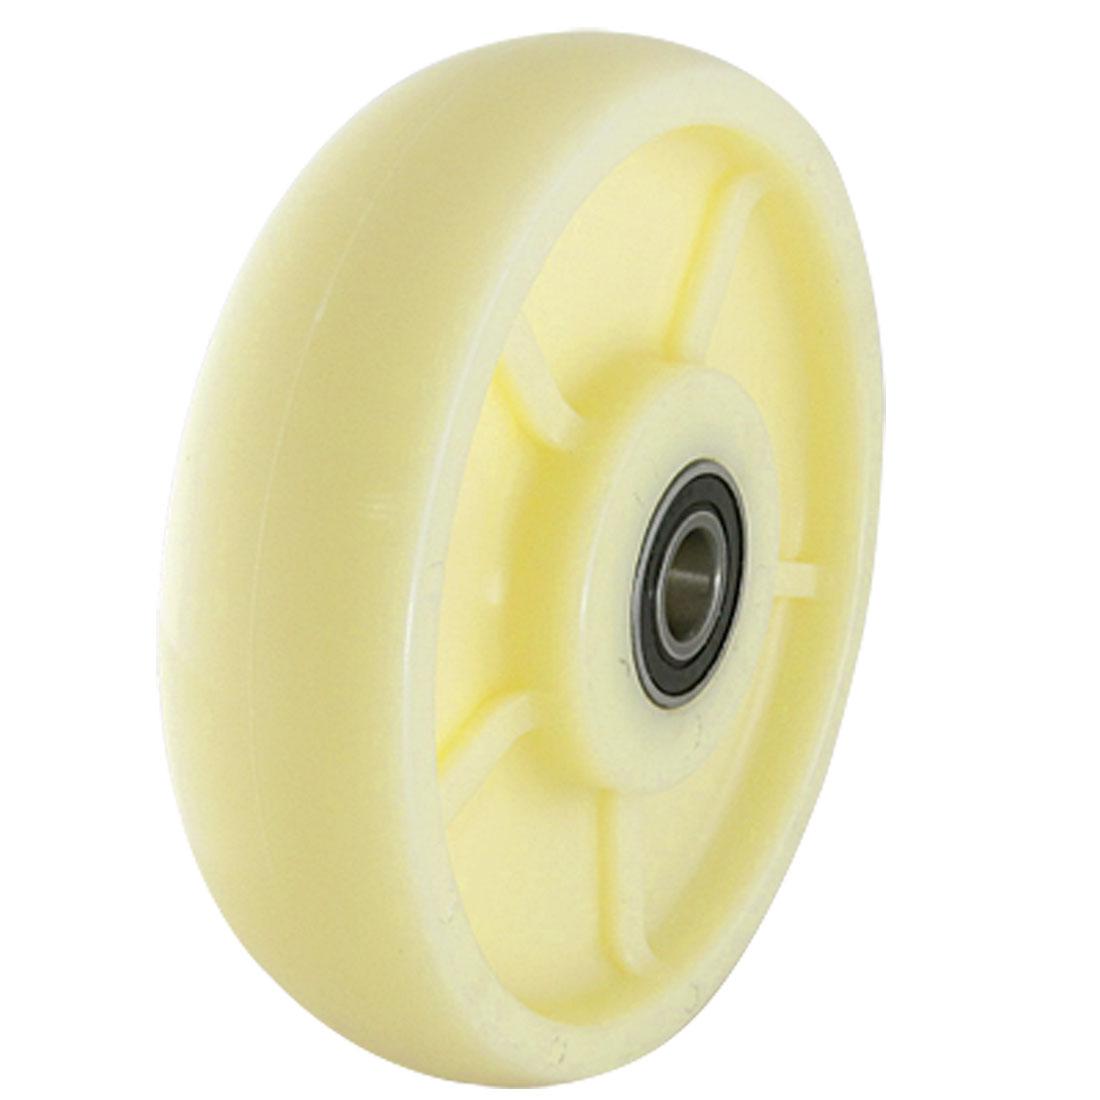 "7.4"" Diameter Pallet Truck Replacement Nylon Rear Steer Wheel"